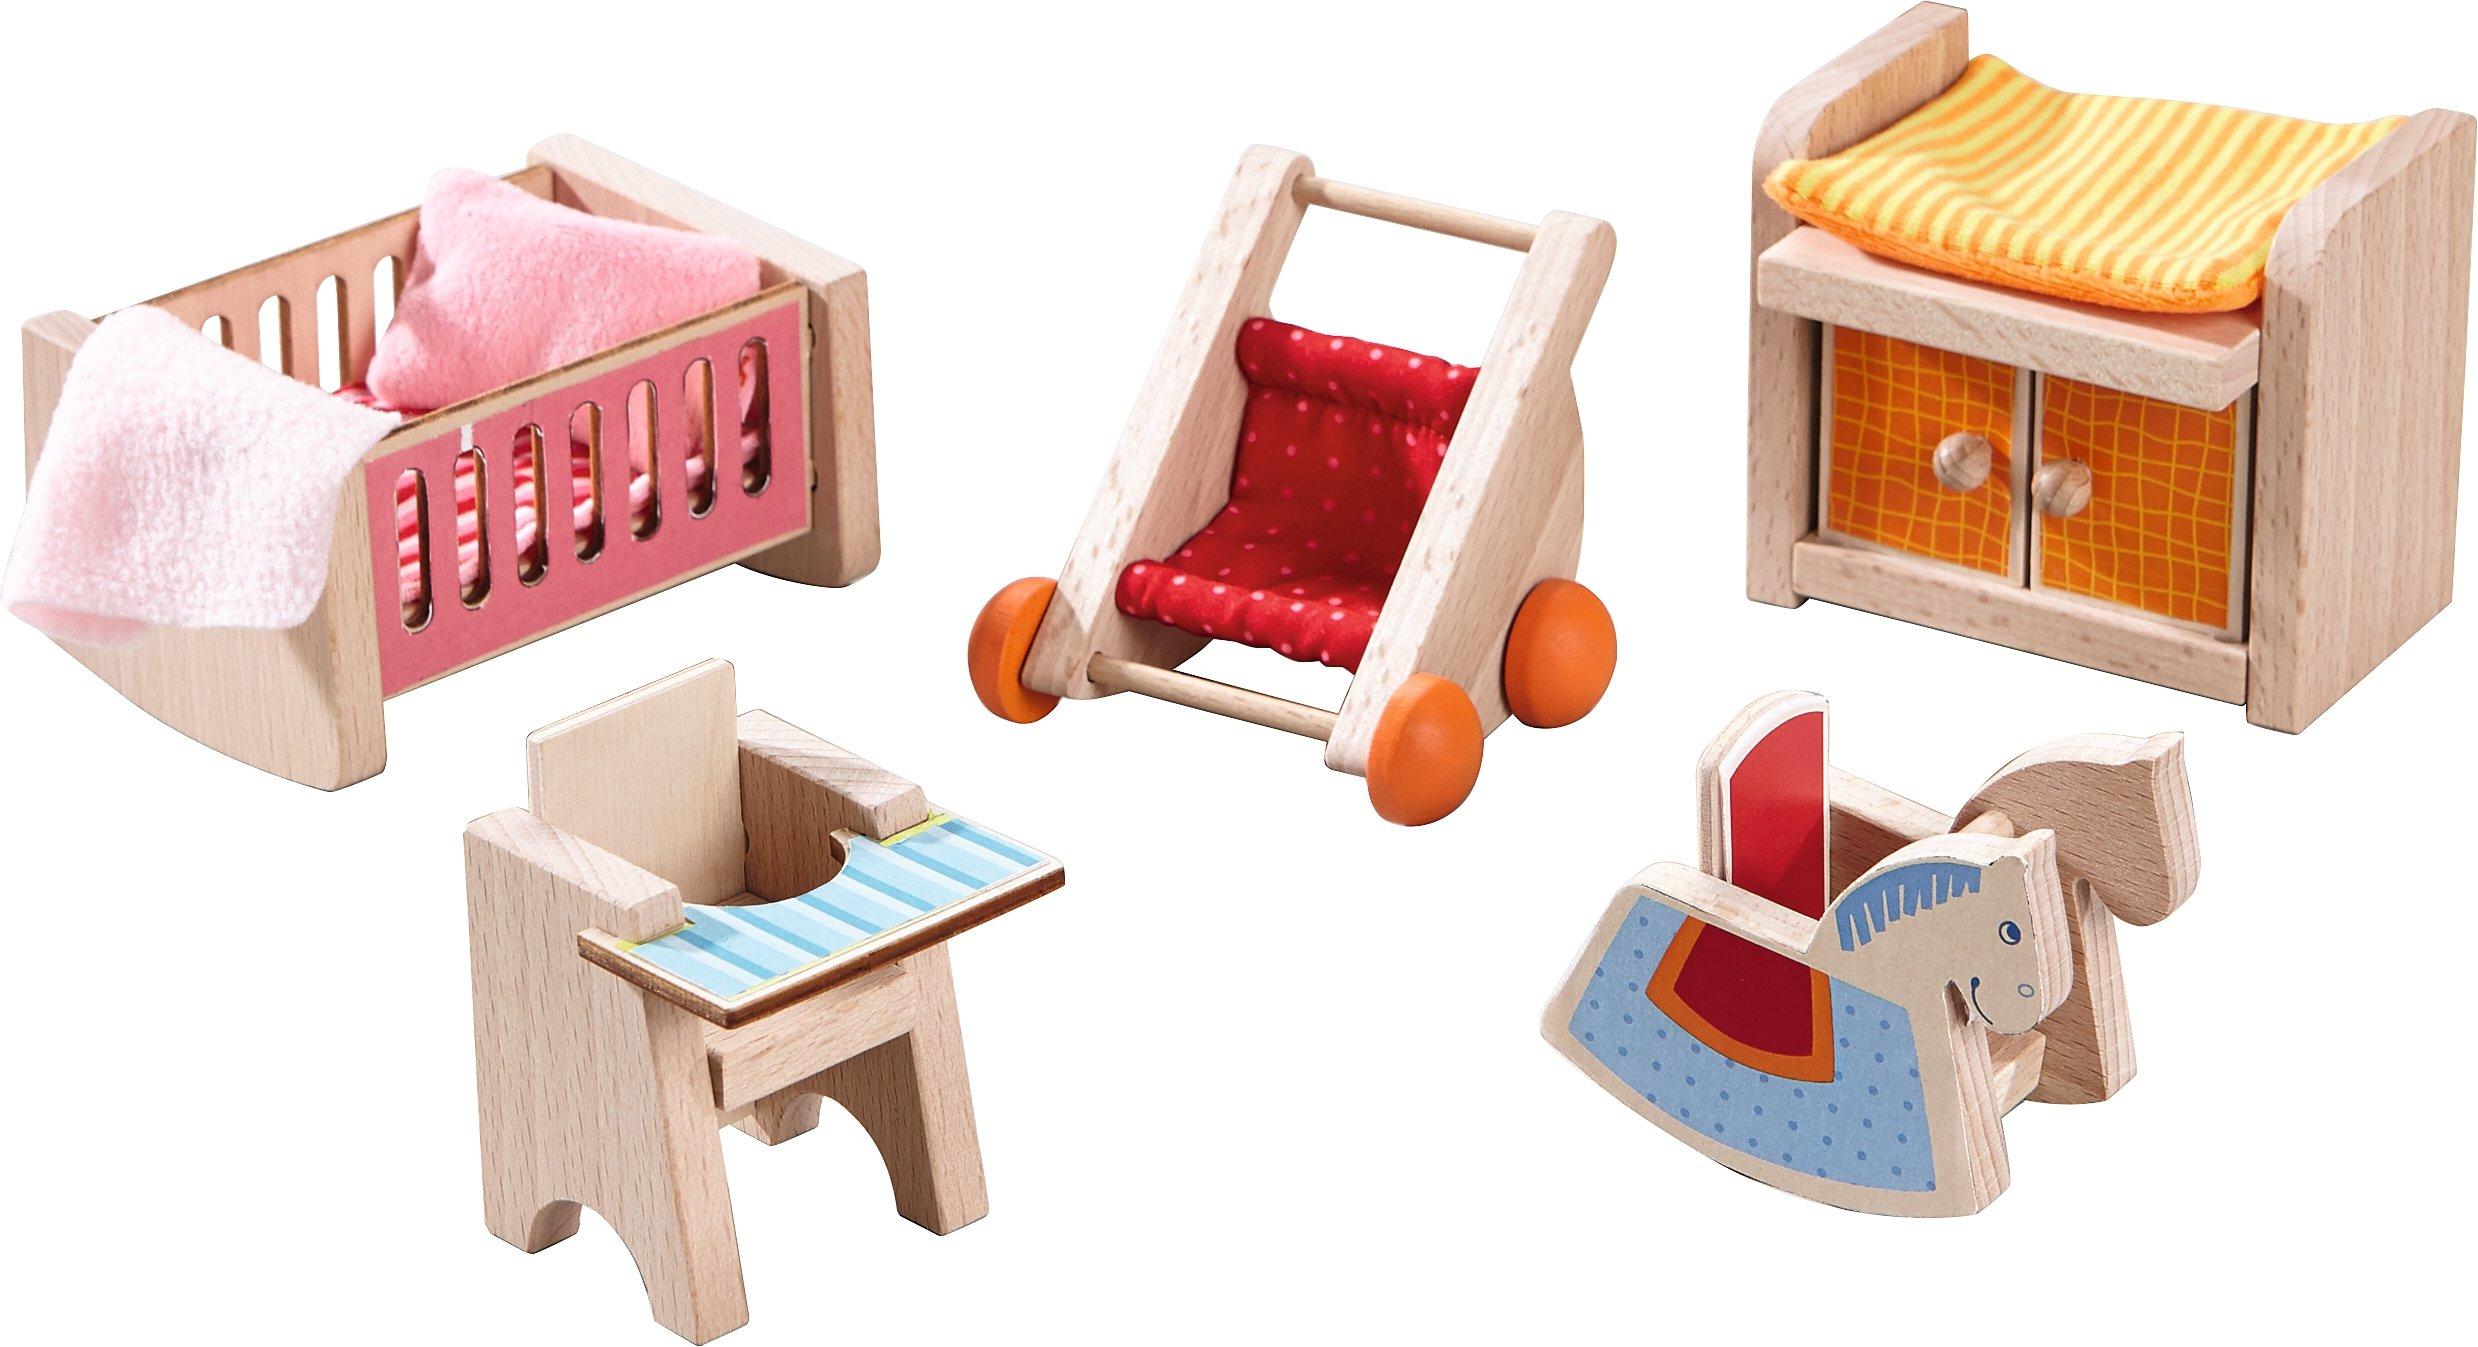 HABA Little Friends Children's Nursery Room - Dollhouse Furniture for 4'' Bendy Dolls